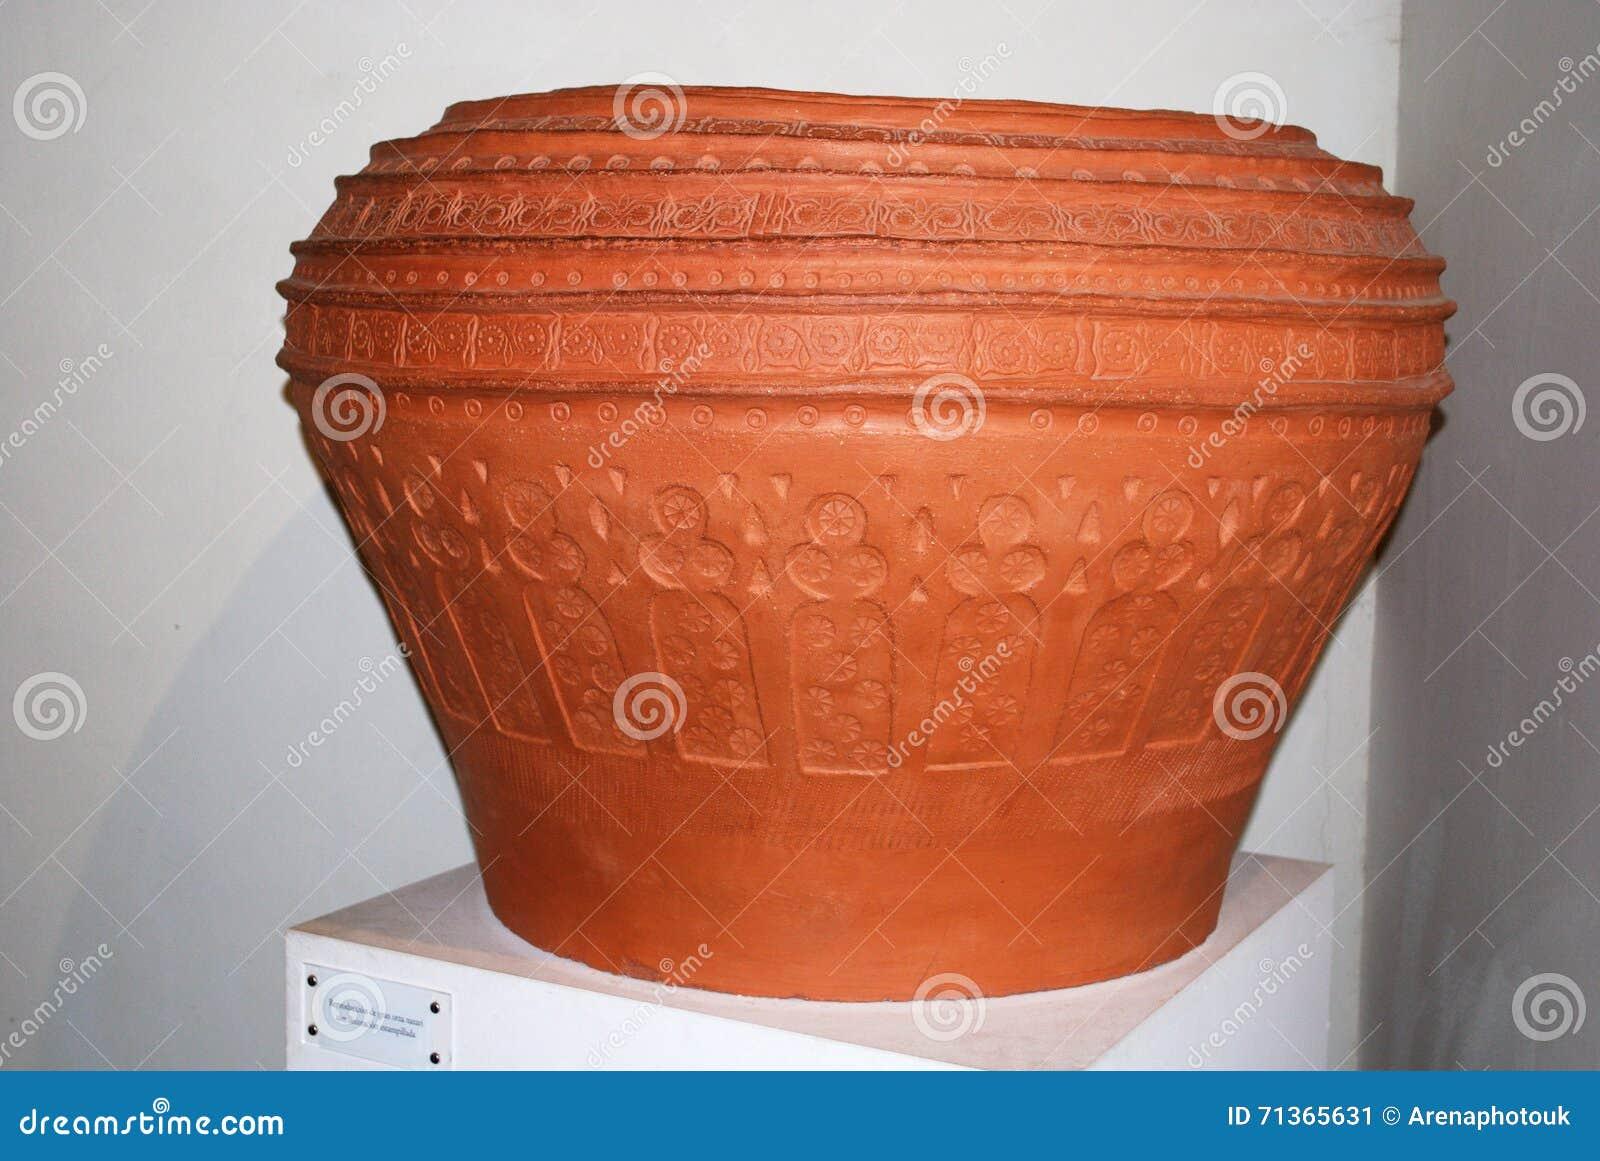 large terracotta pot, malaga castle museum. stock photo - image